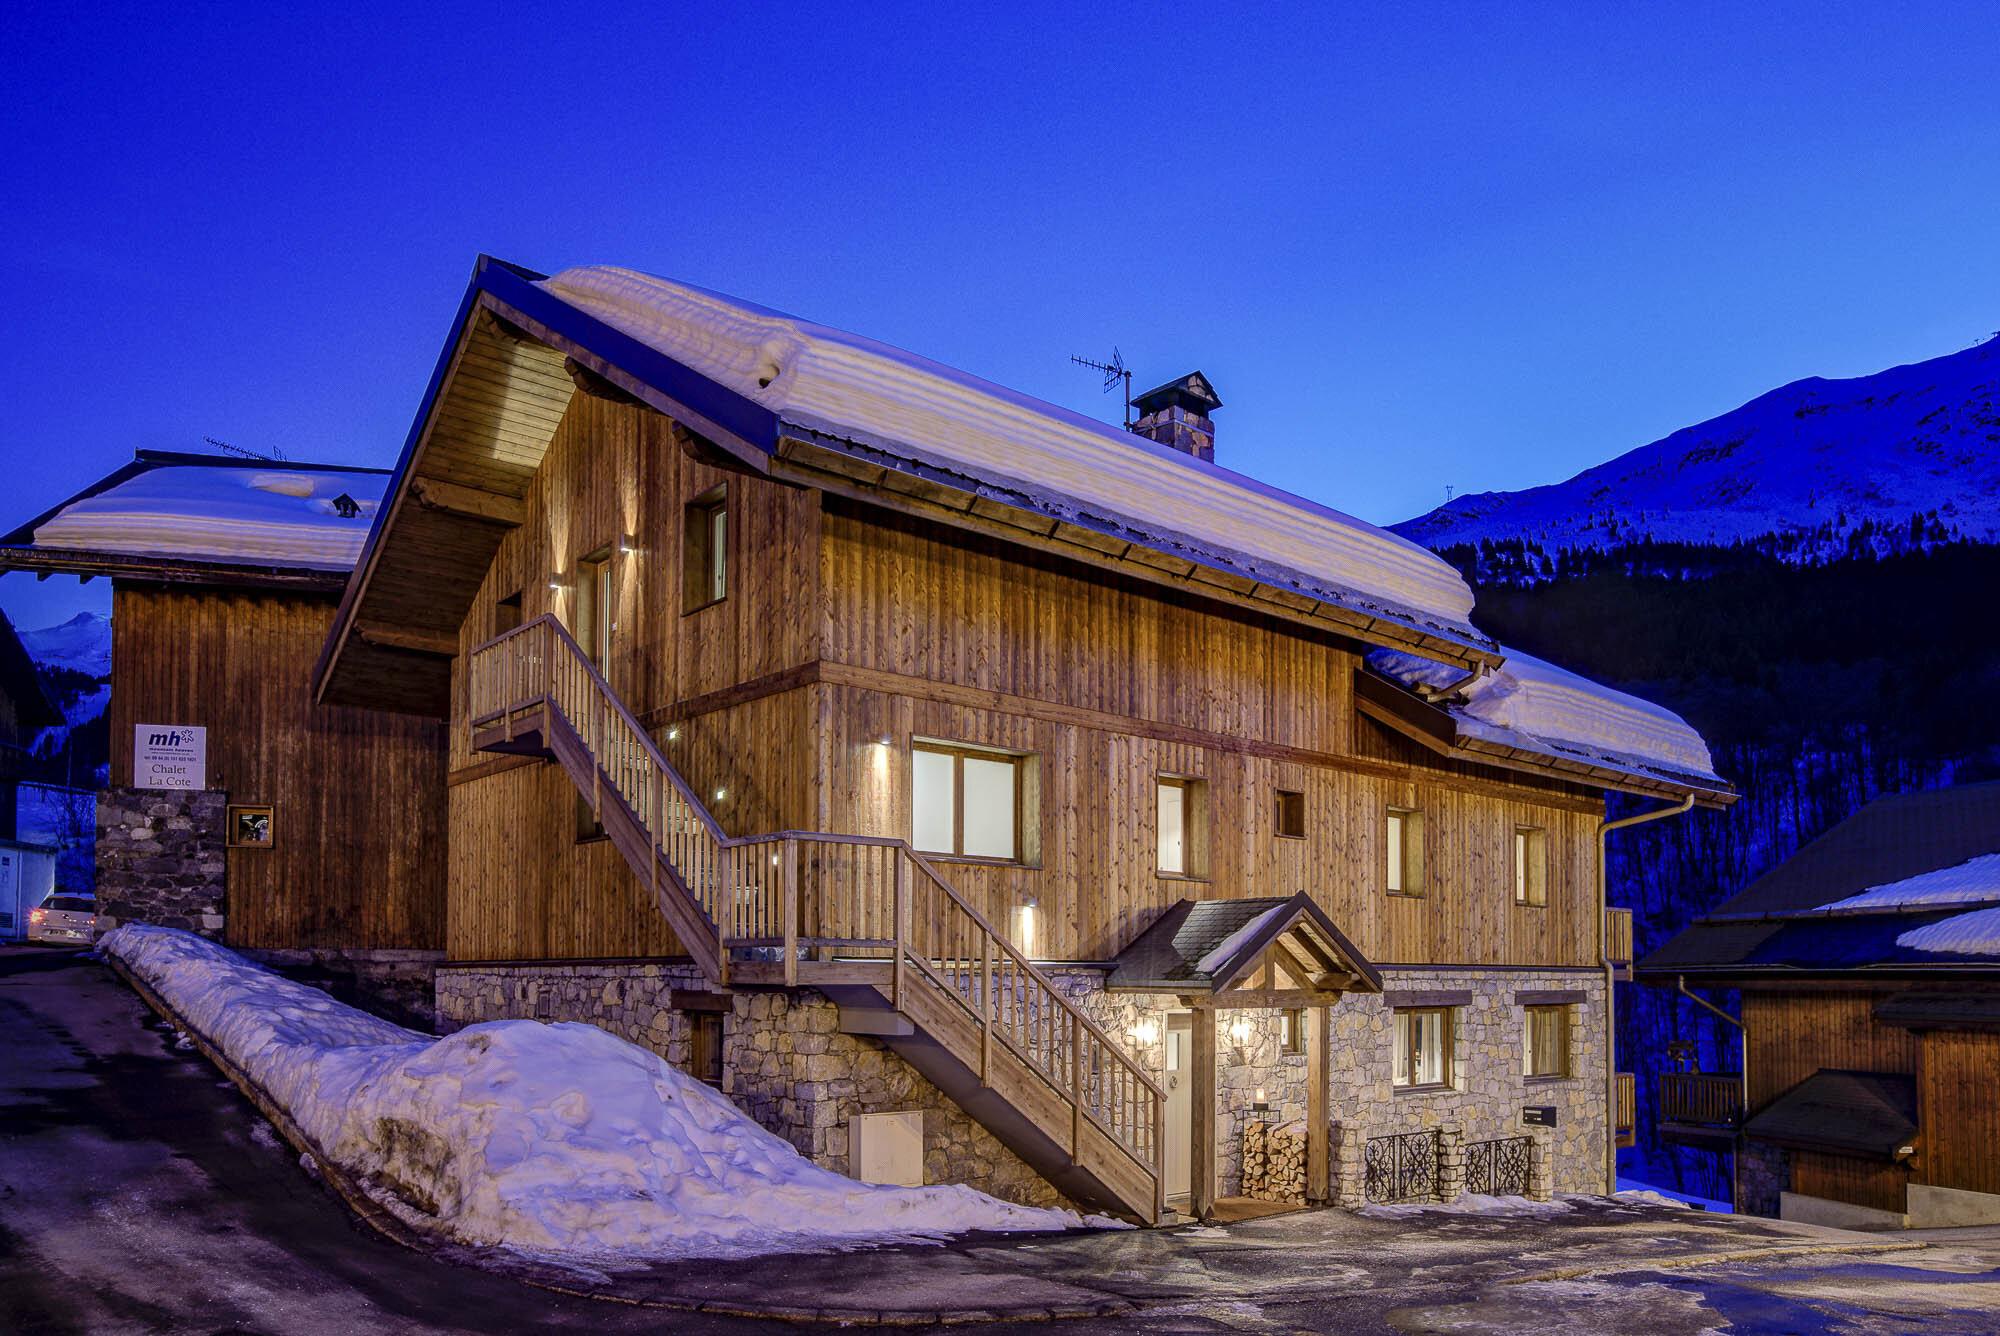 tg-ski-luxury-chalet-lightbowne-meribel-001.jpg